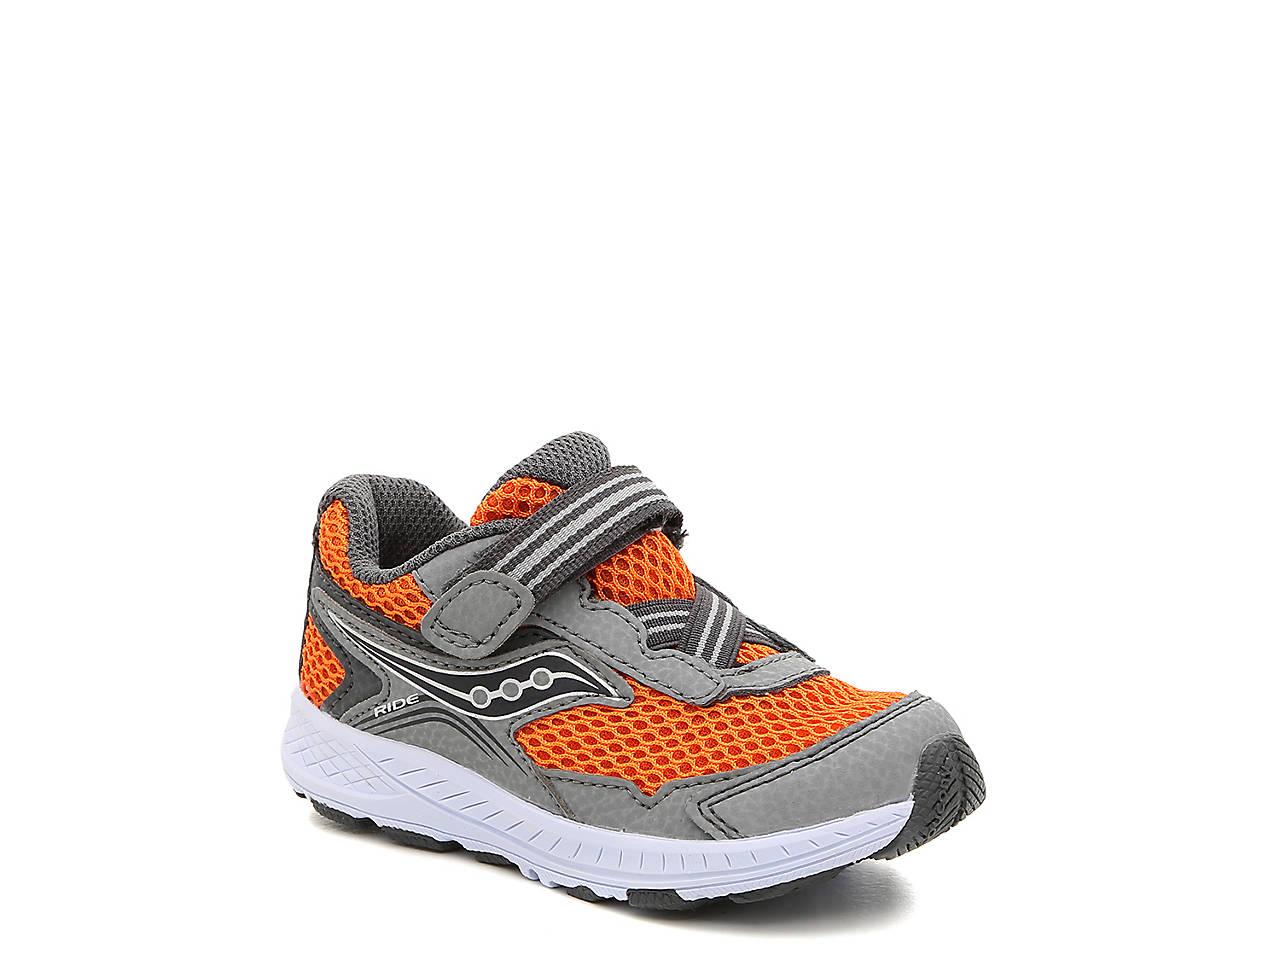 02997e0c Ride 10 Jr Sneaker - Kids'